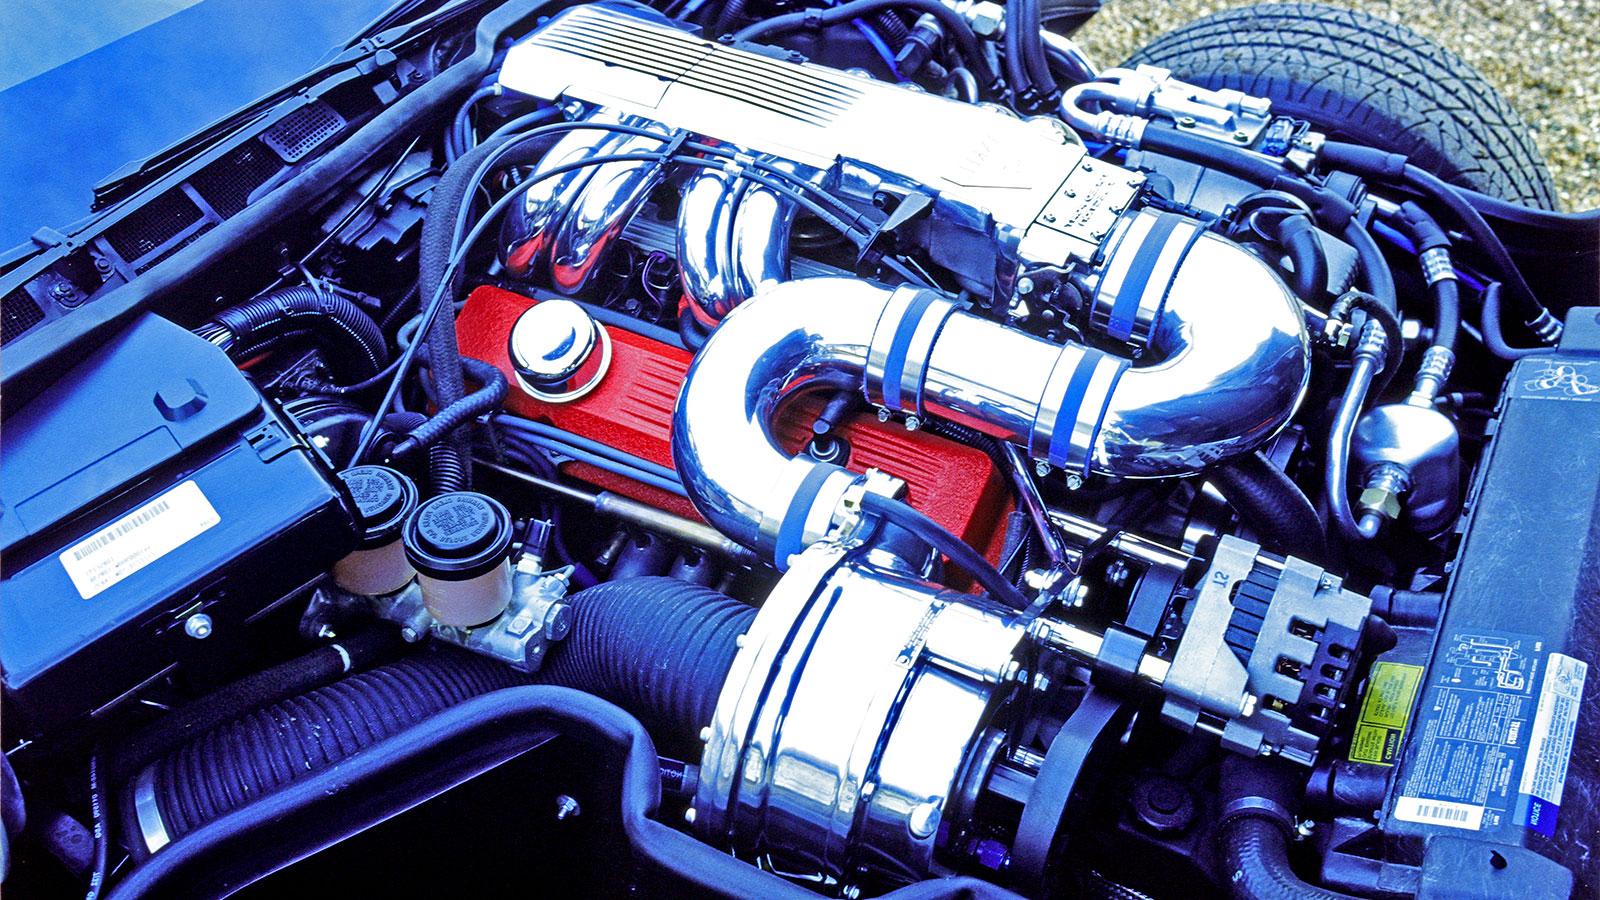 Jankel Tempest engine